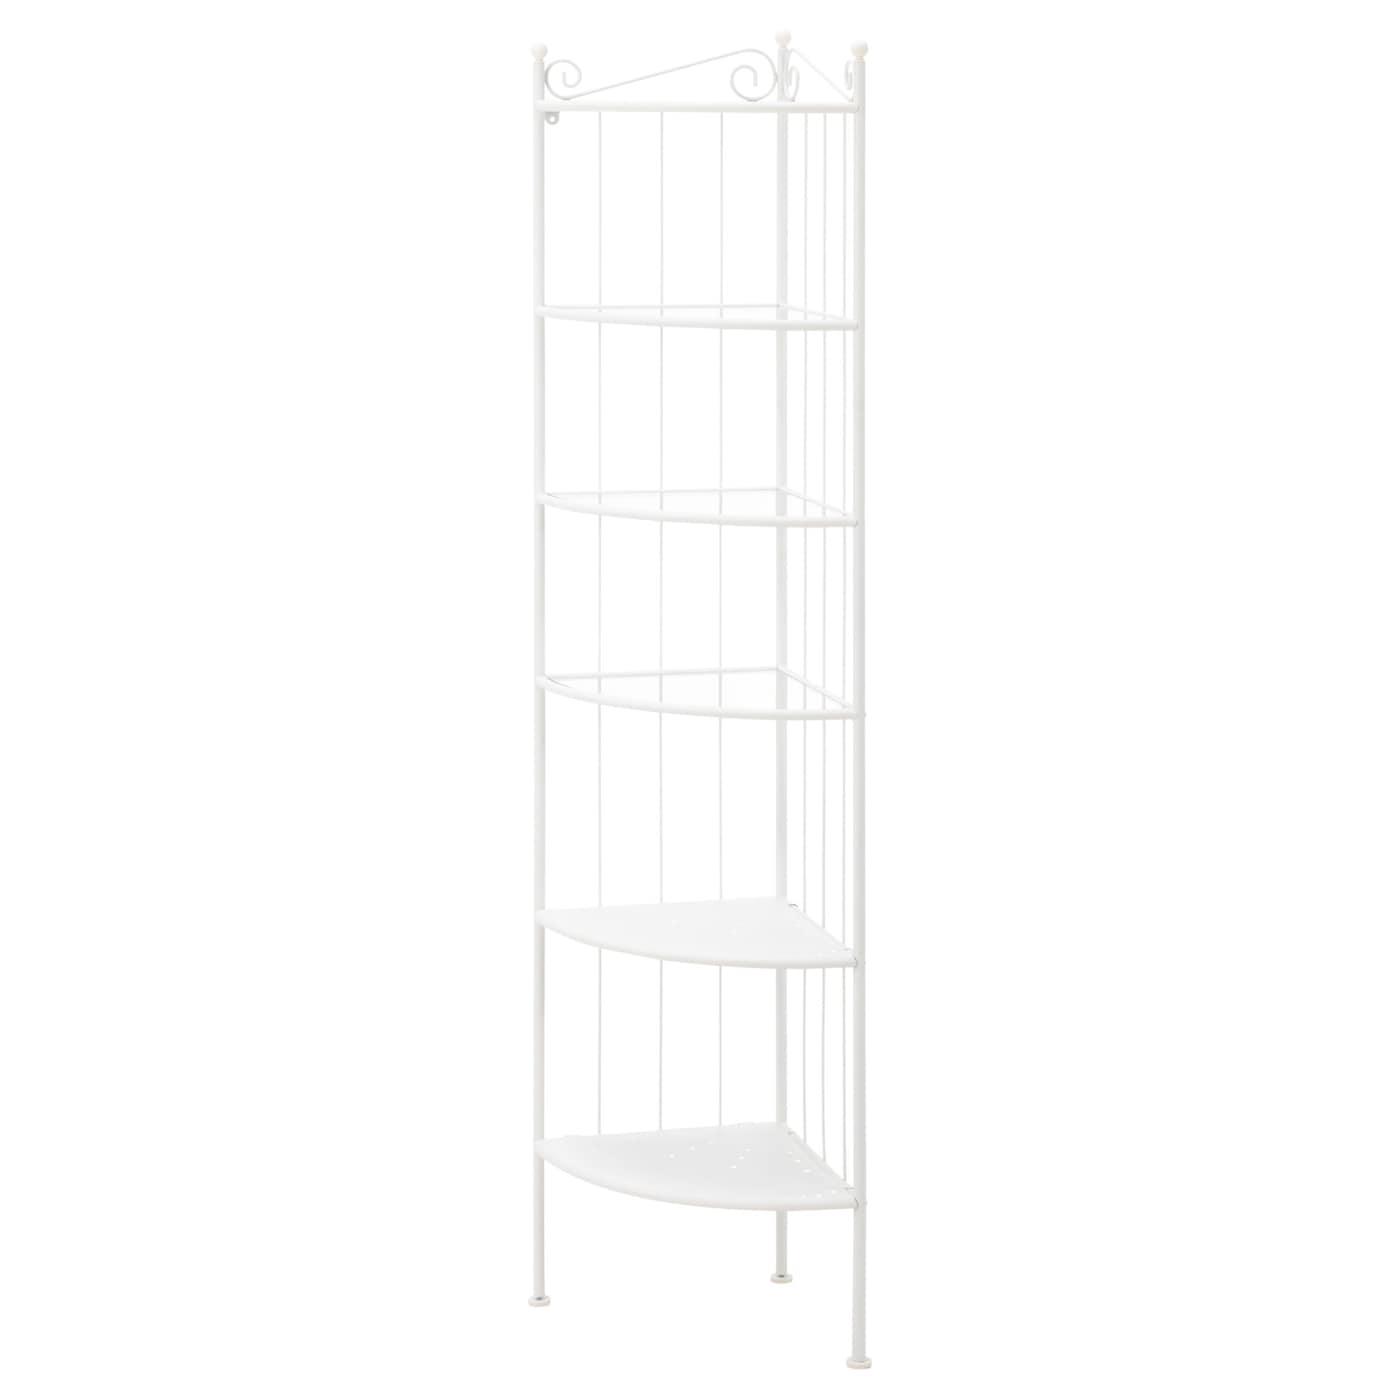 R Nnsk R Corner Shelf Unit White Ikea